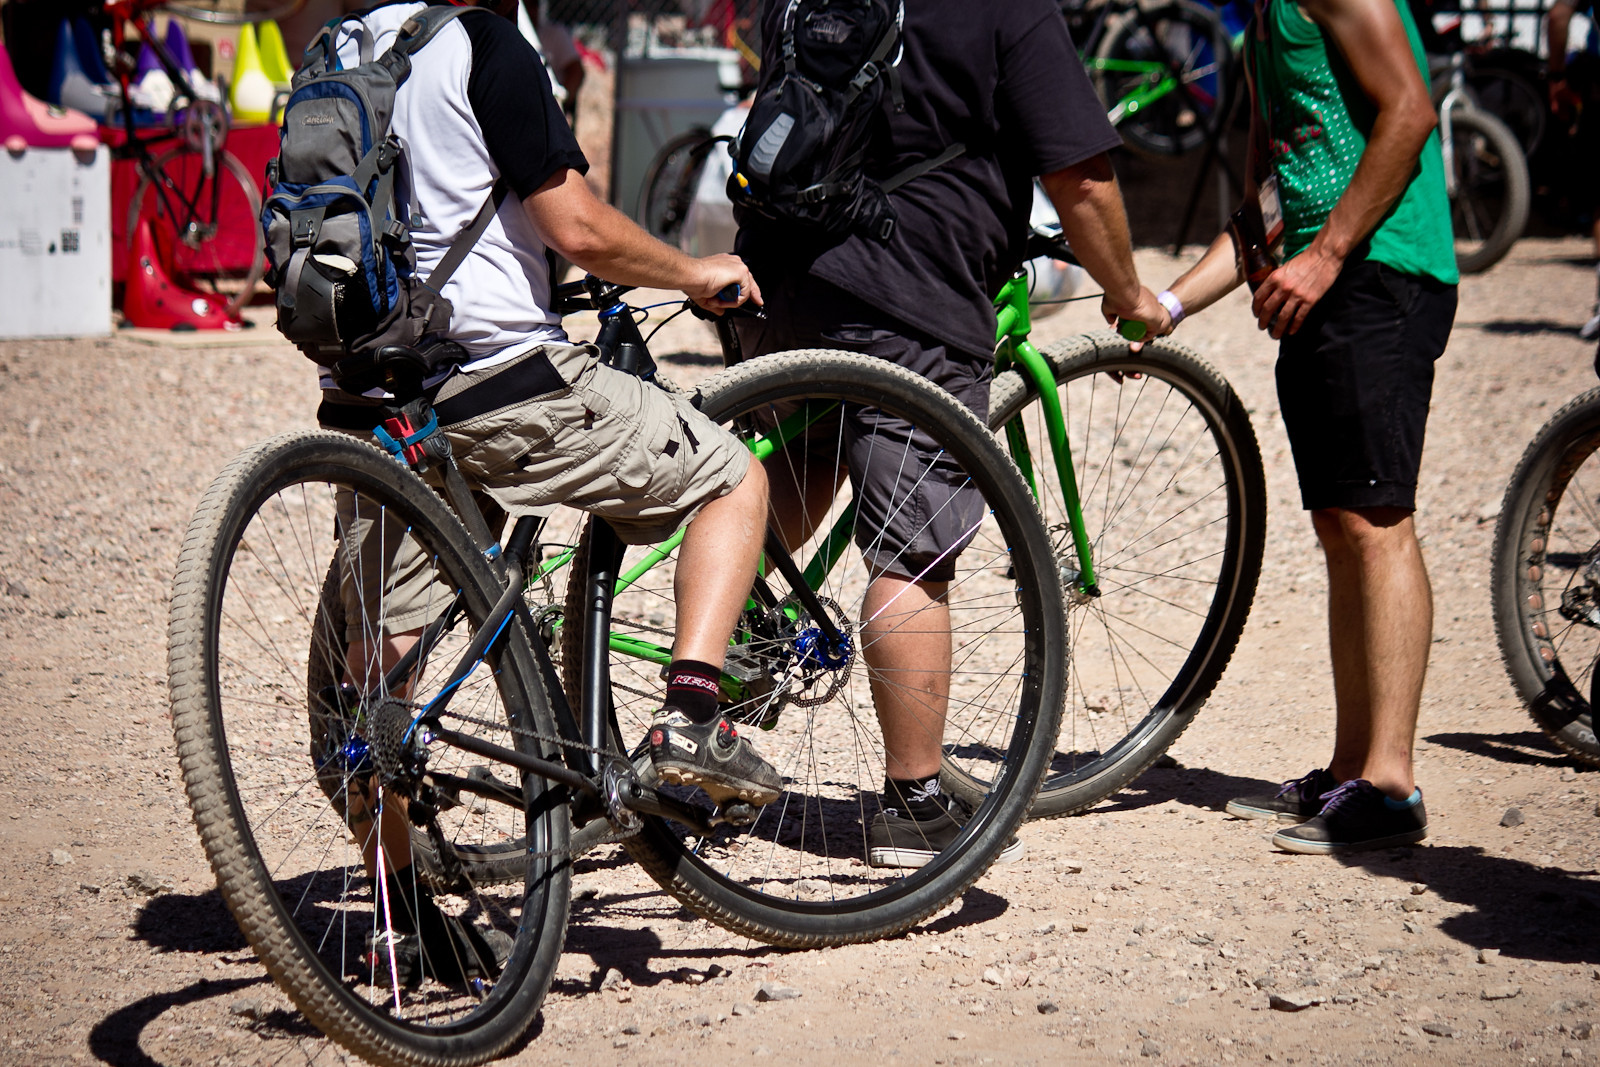 INTERBIKE: Part 1 - Outdoor Demo Rad Bits & Randoms - INTERBIKE: Part 1 - Outdoor Demo Rad Bits & Randoms - Mountain Biking Pictures - Vital MTB